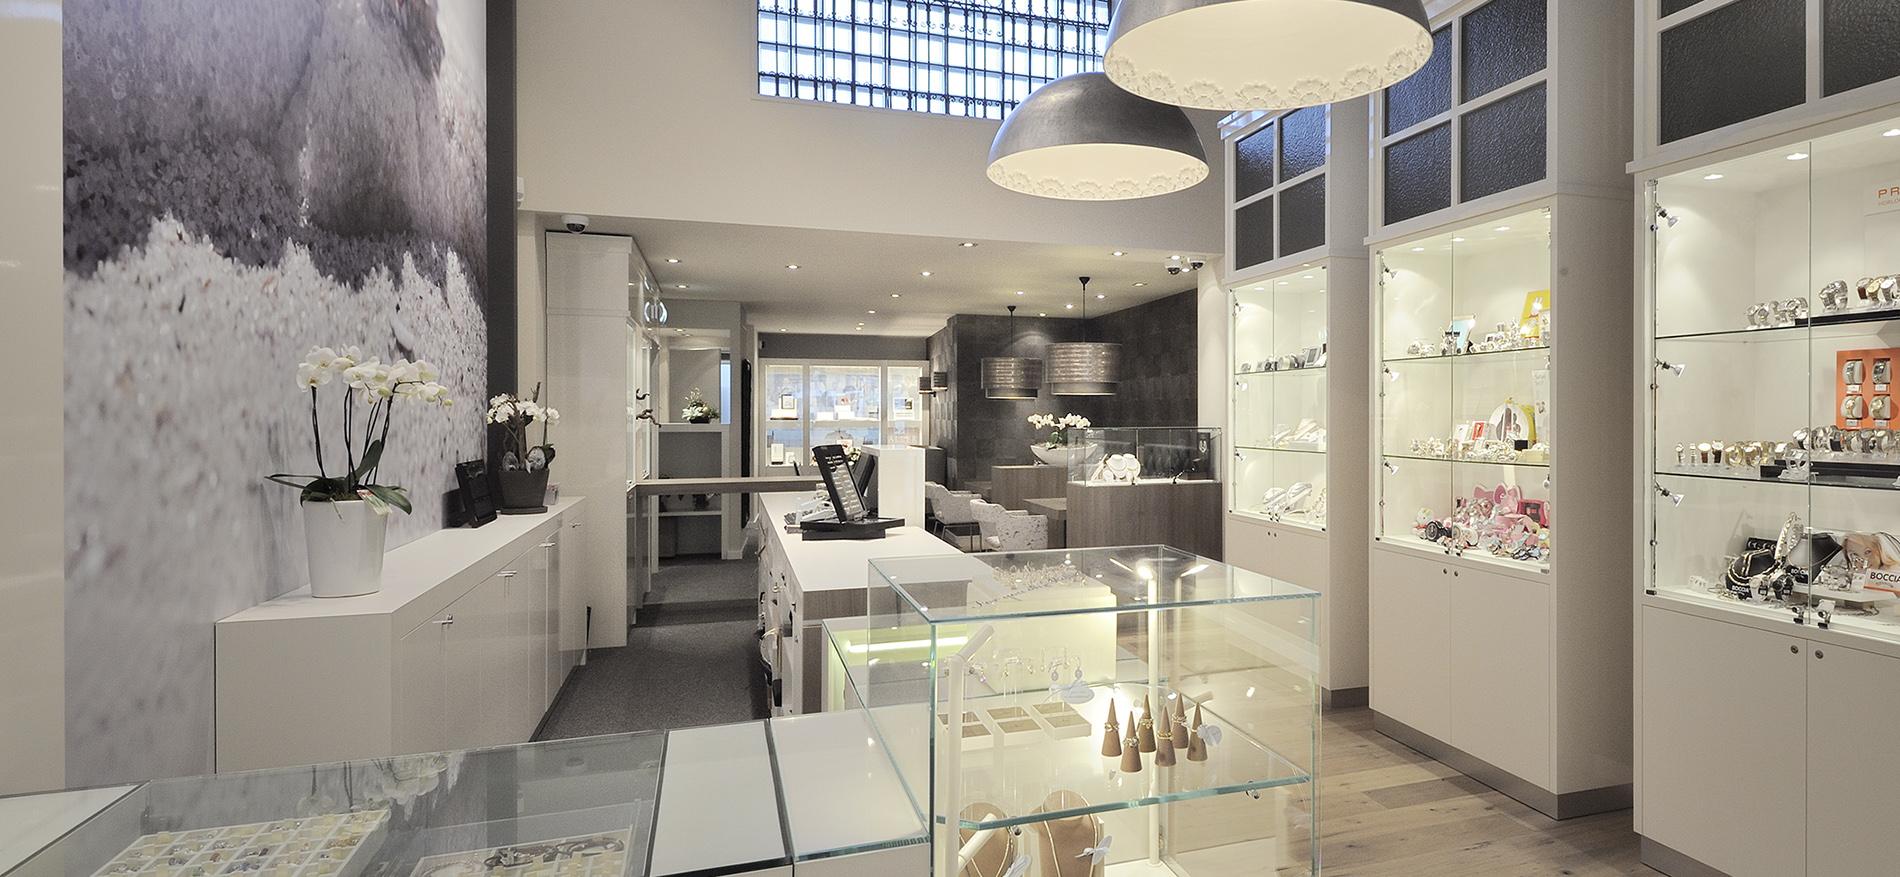 Retail design jewelry